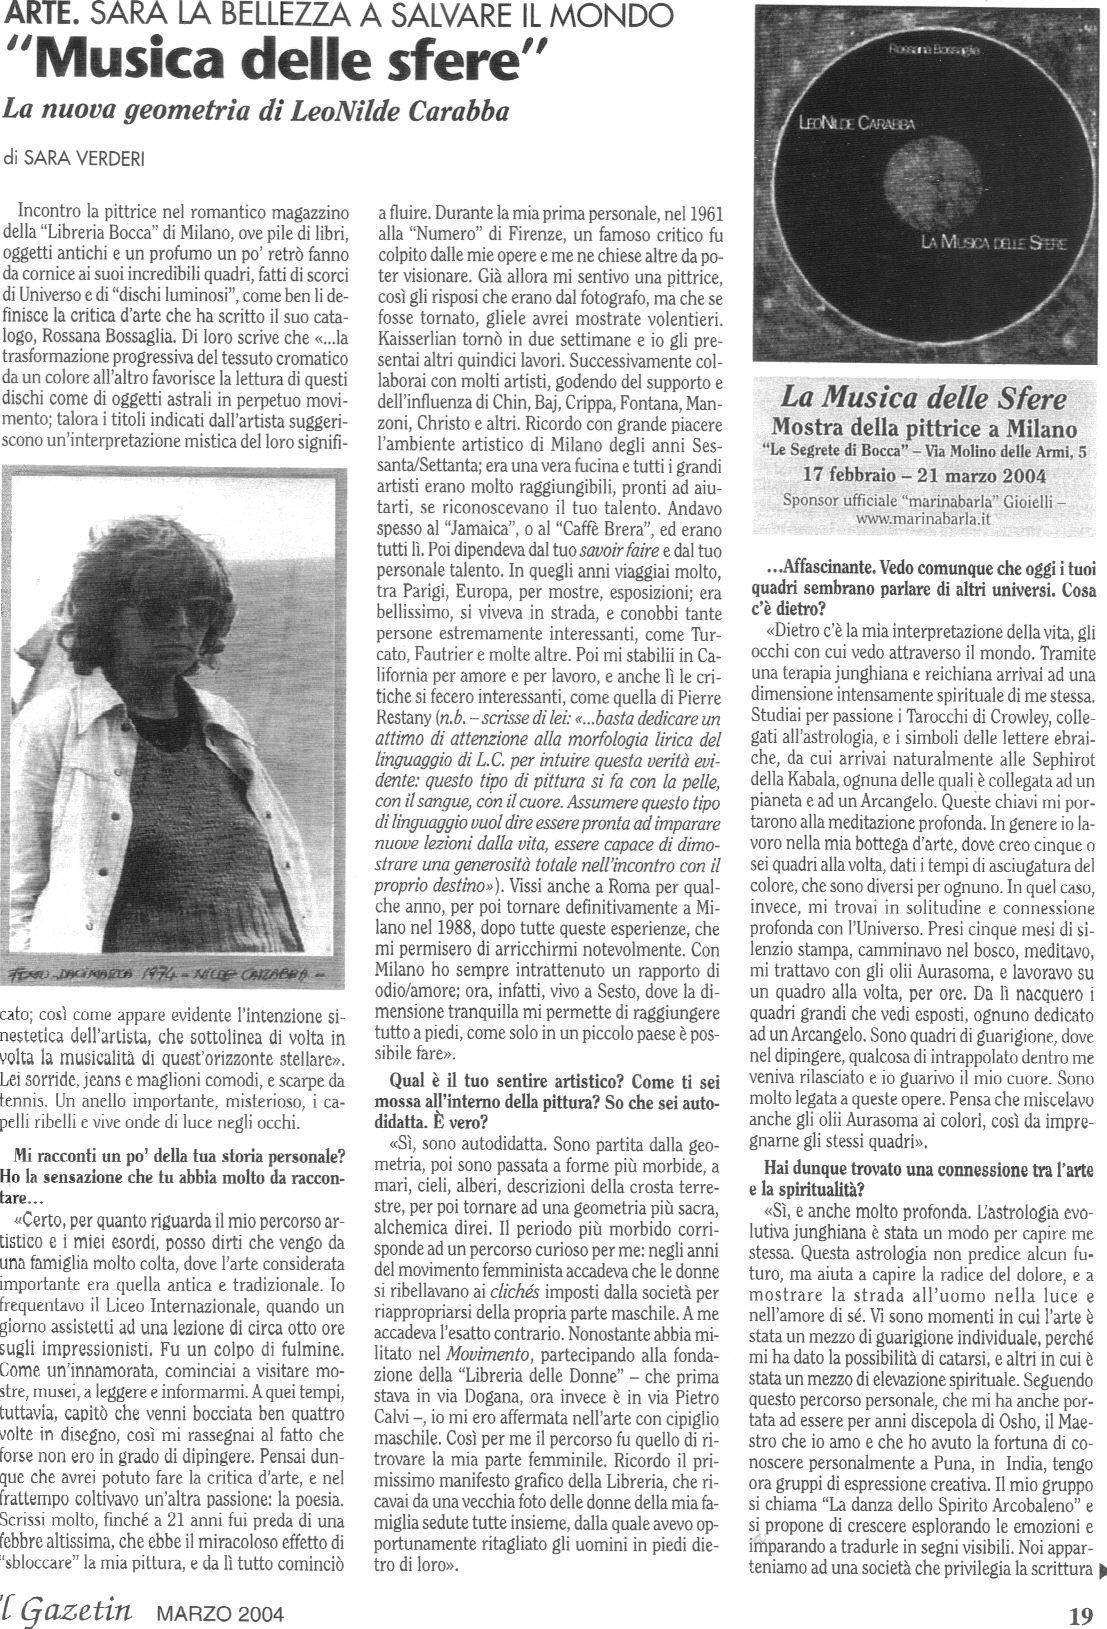 0006_1pag-intervista-sara-verderi_2004